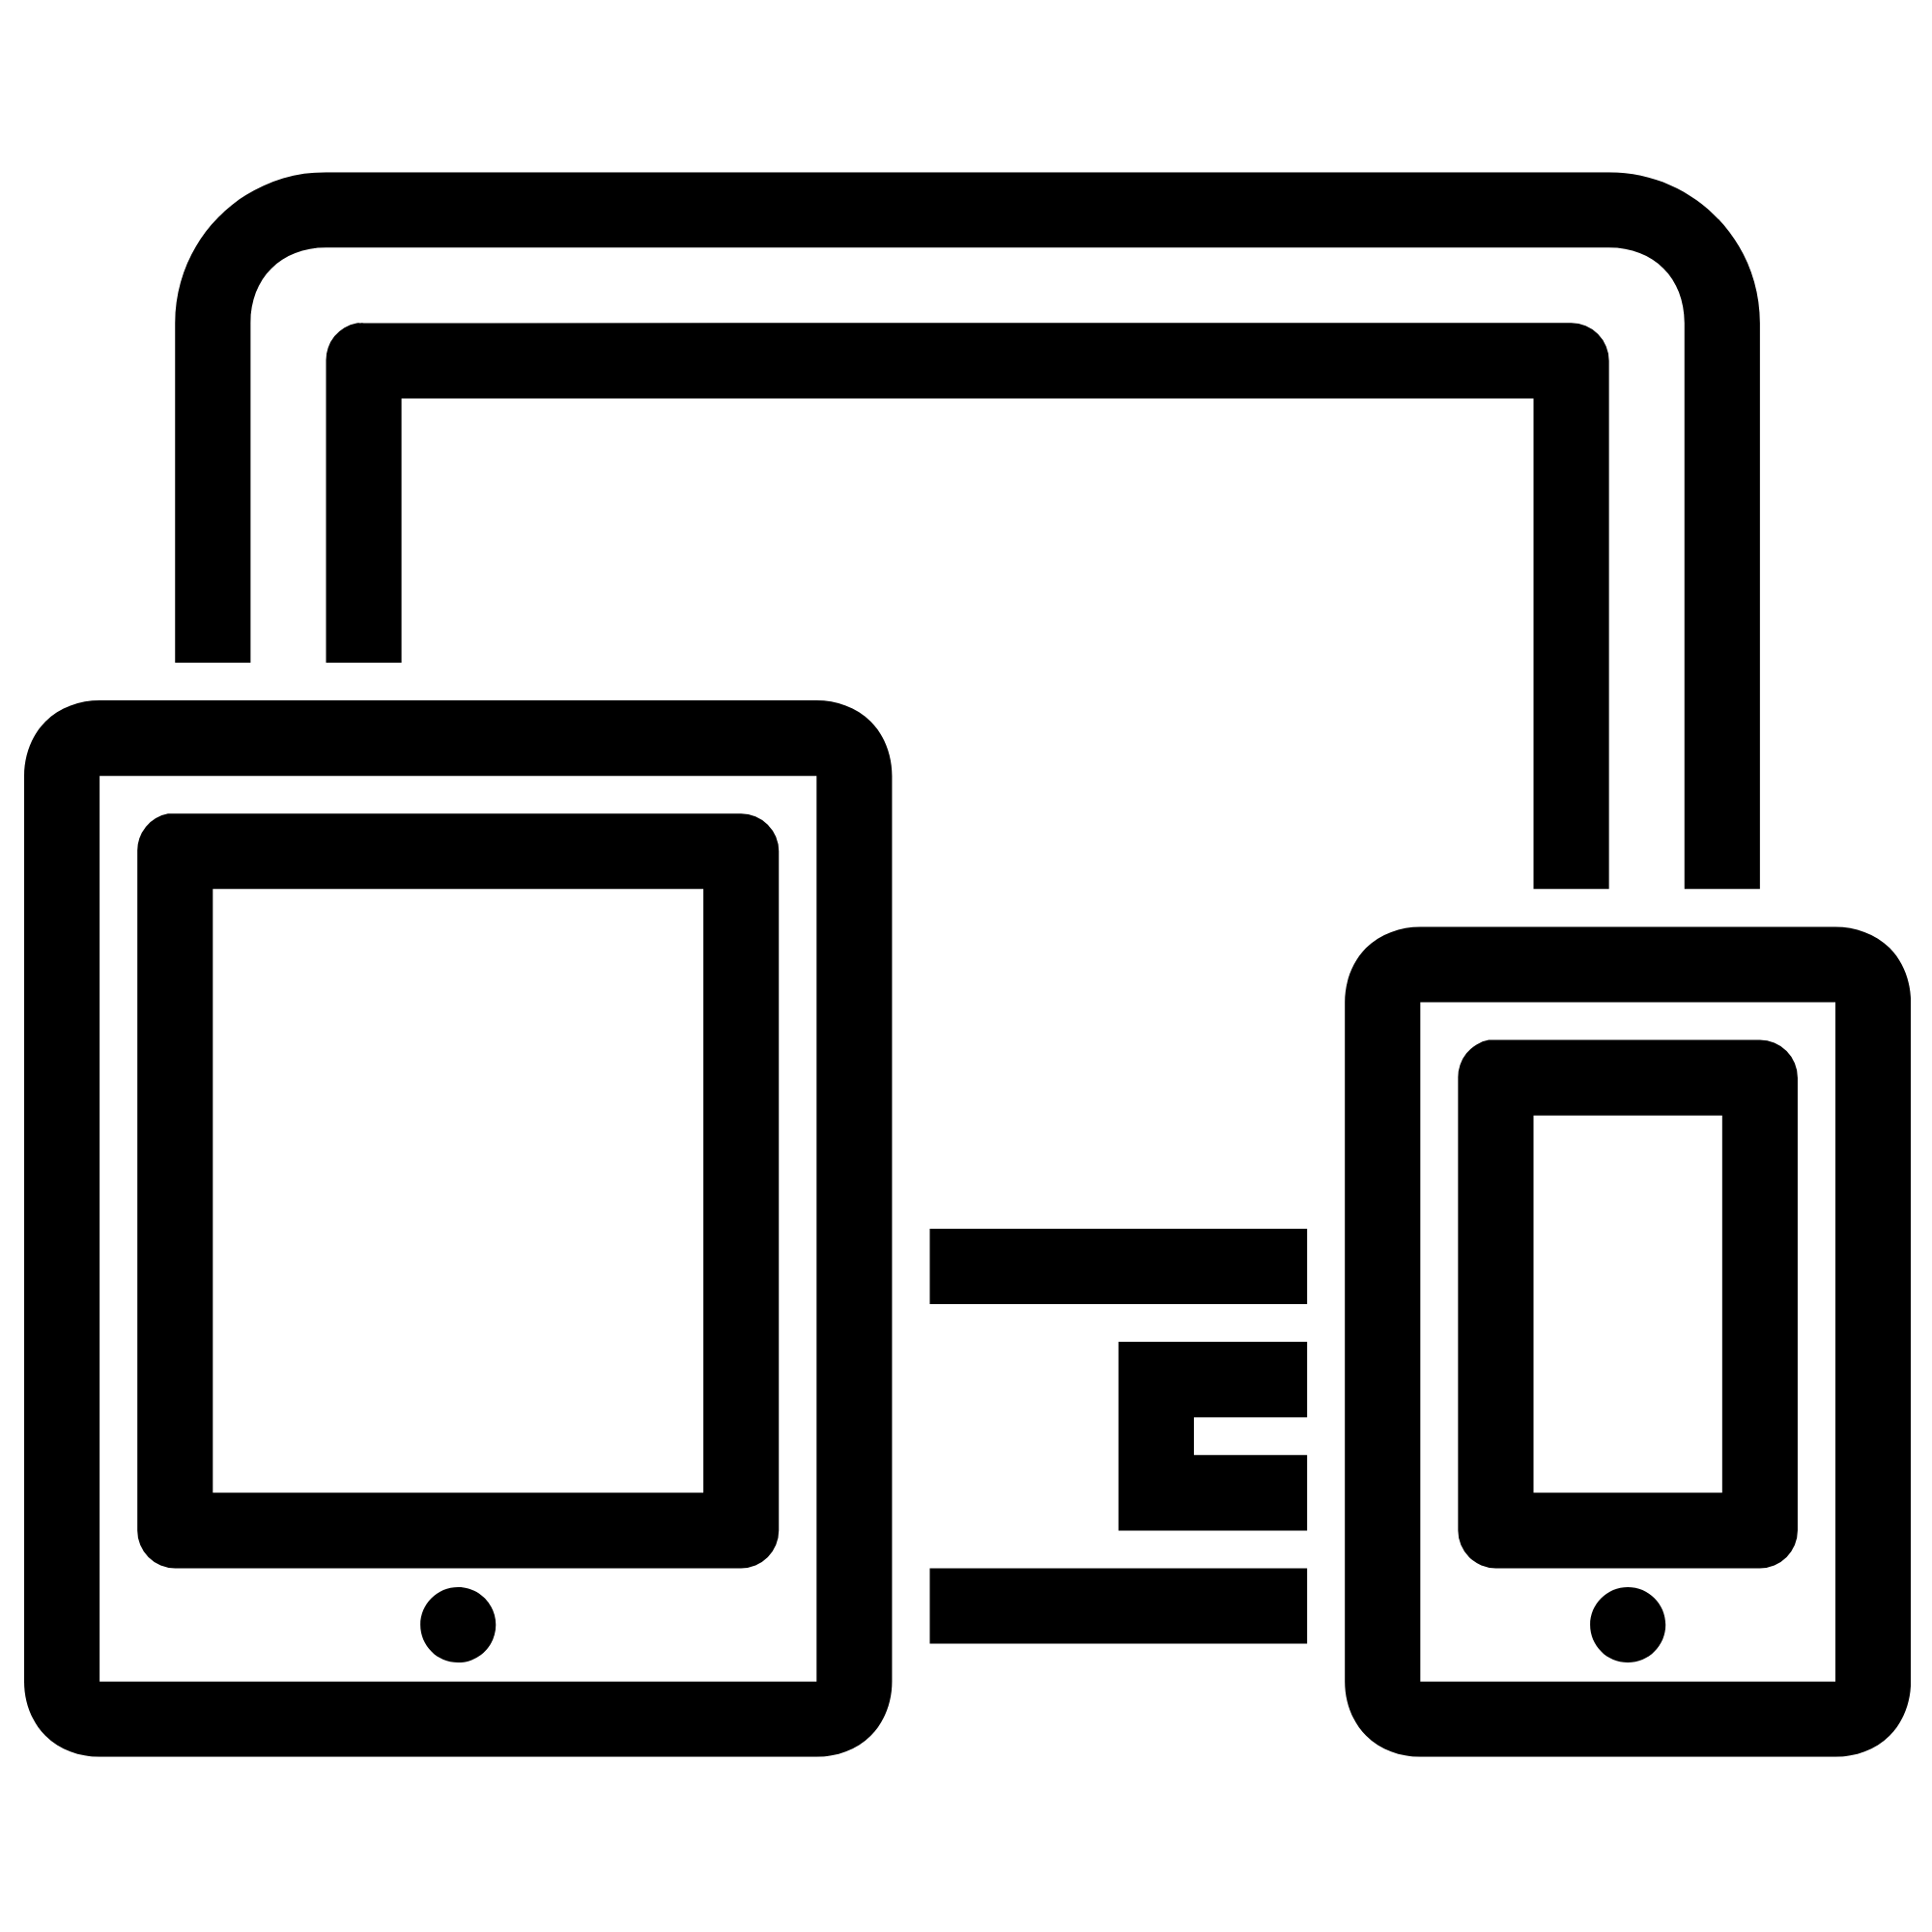 Geräte-Symbol